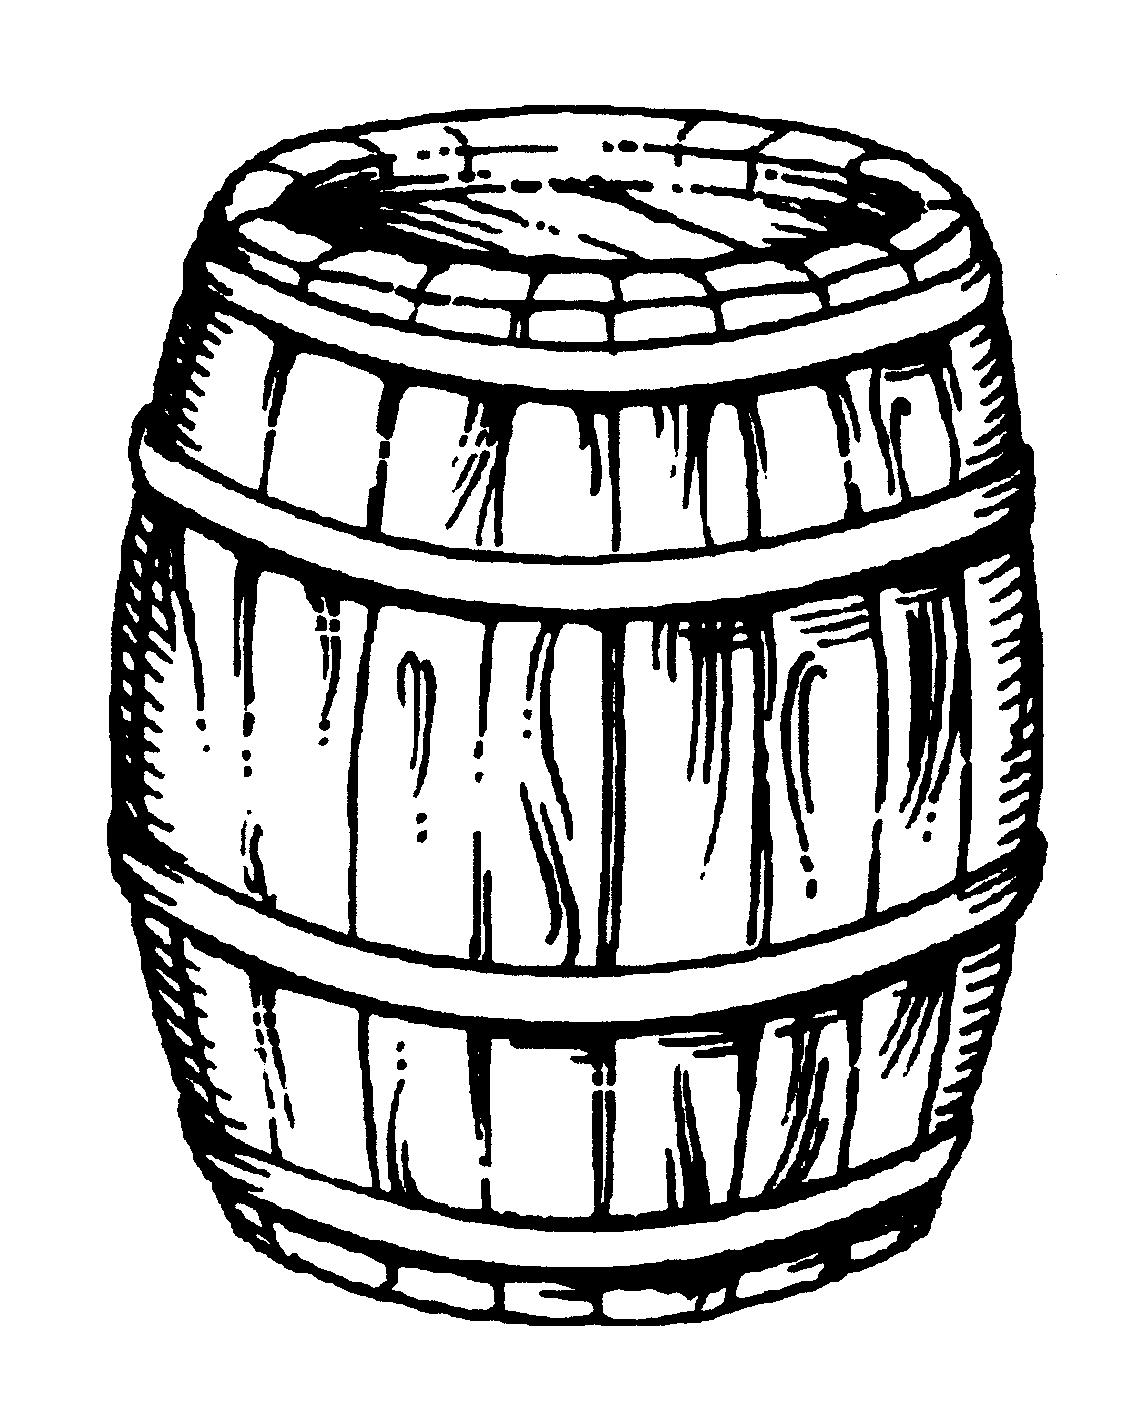 Barrel Clipart Pirate Barrel Barrel Pirate Barrel